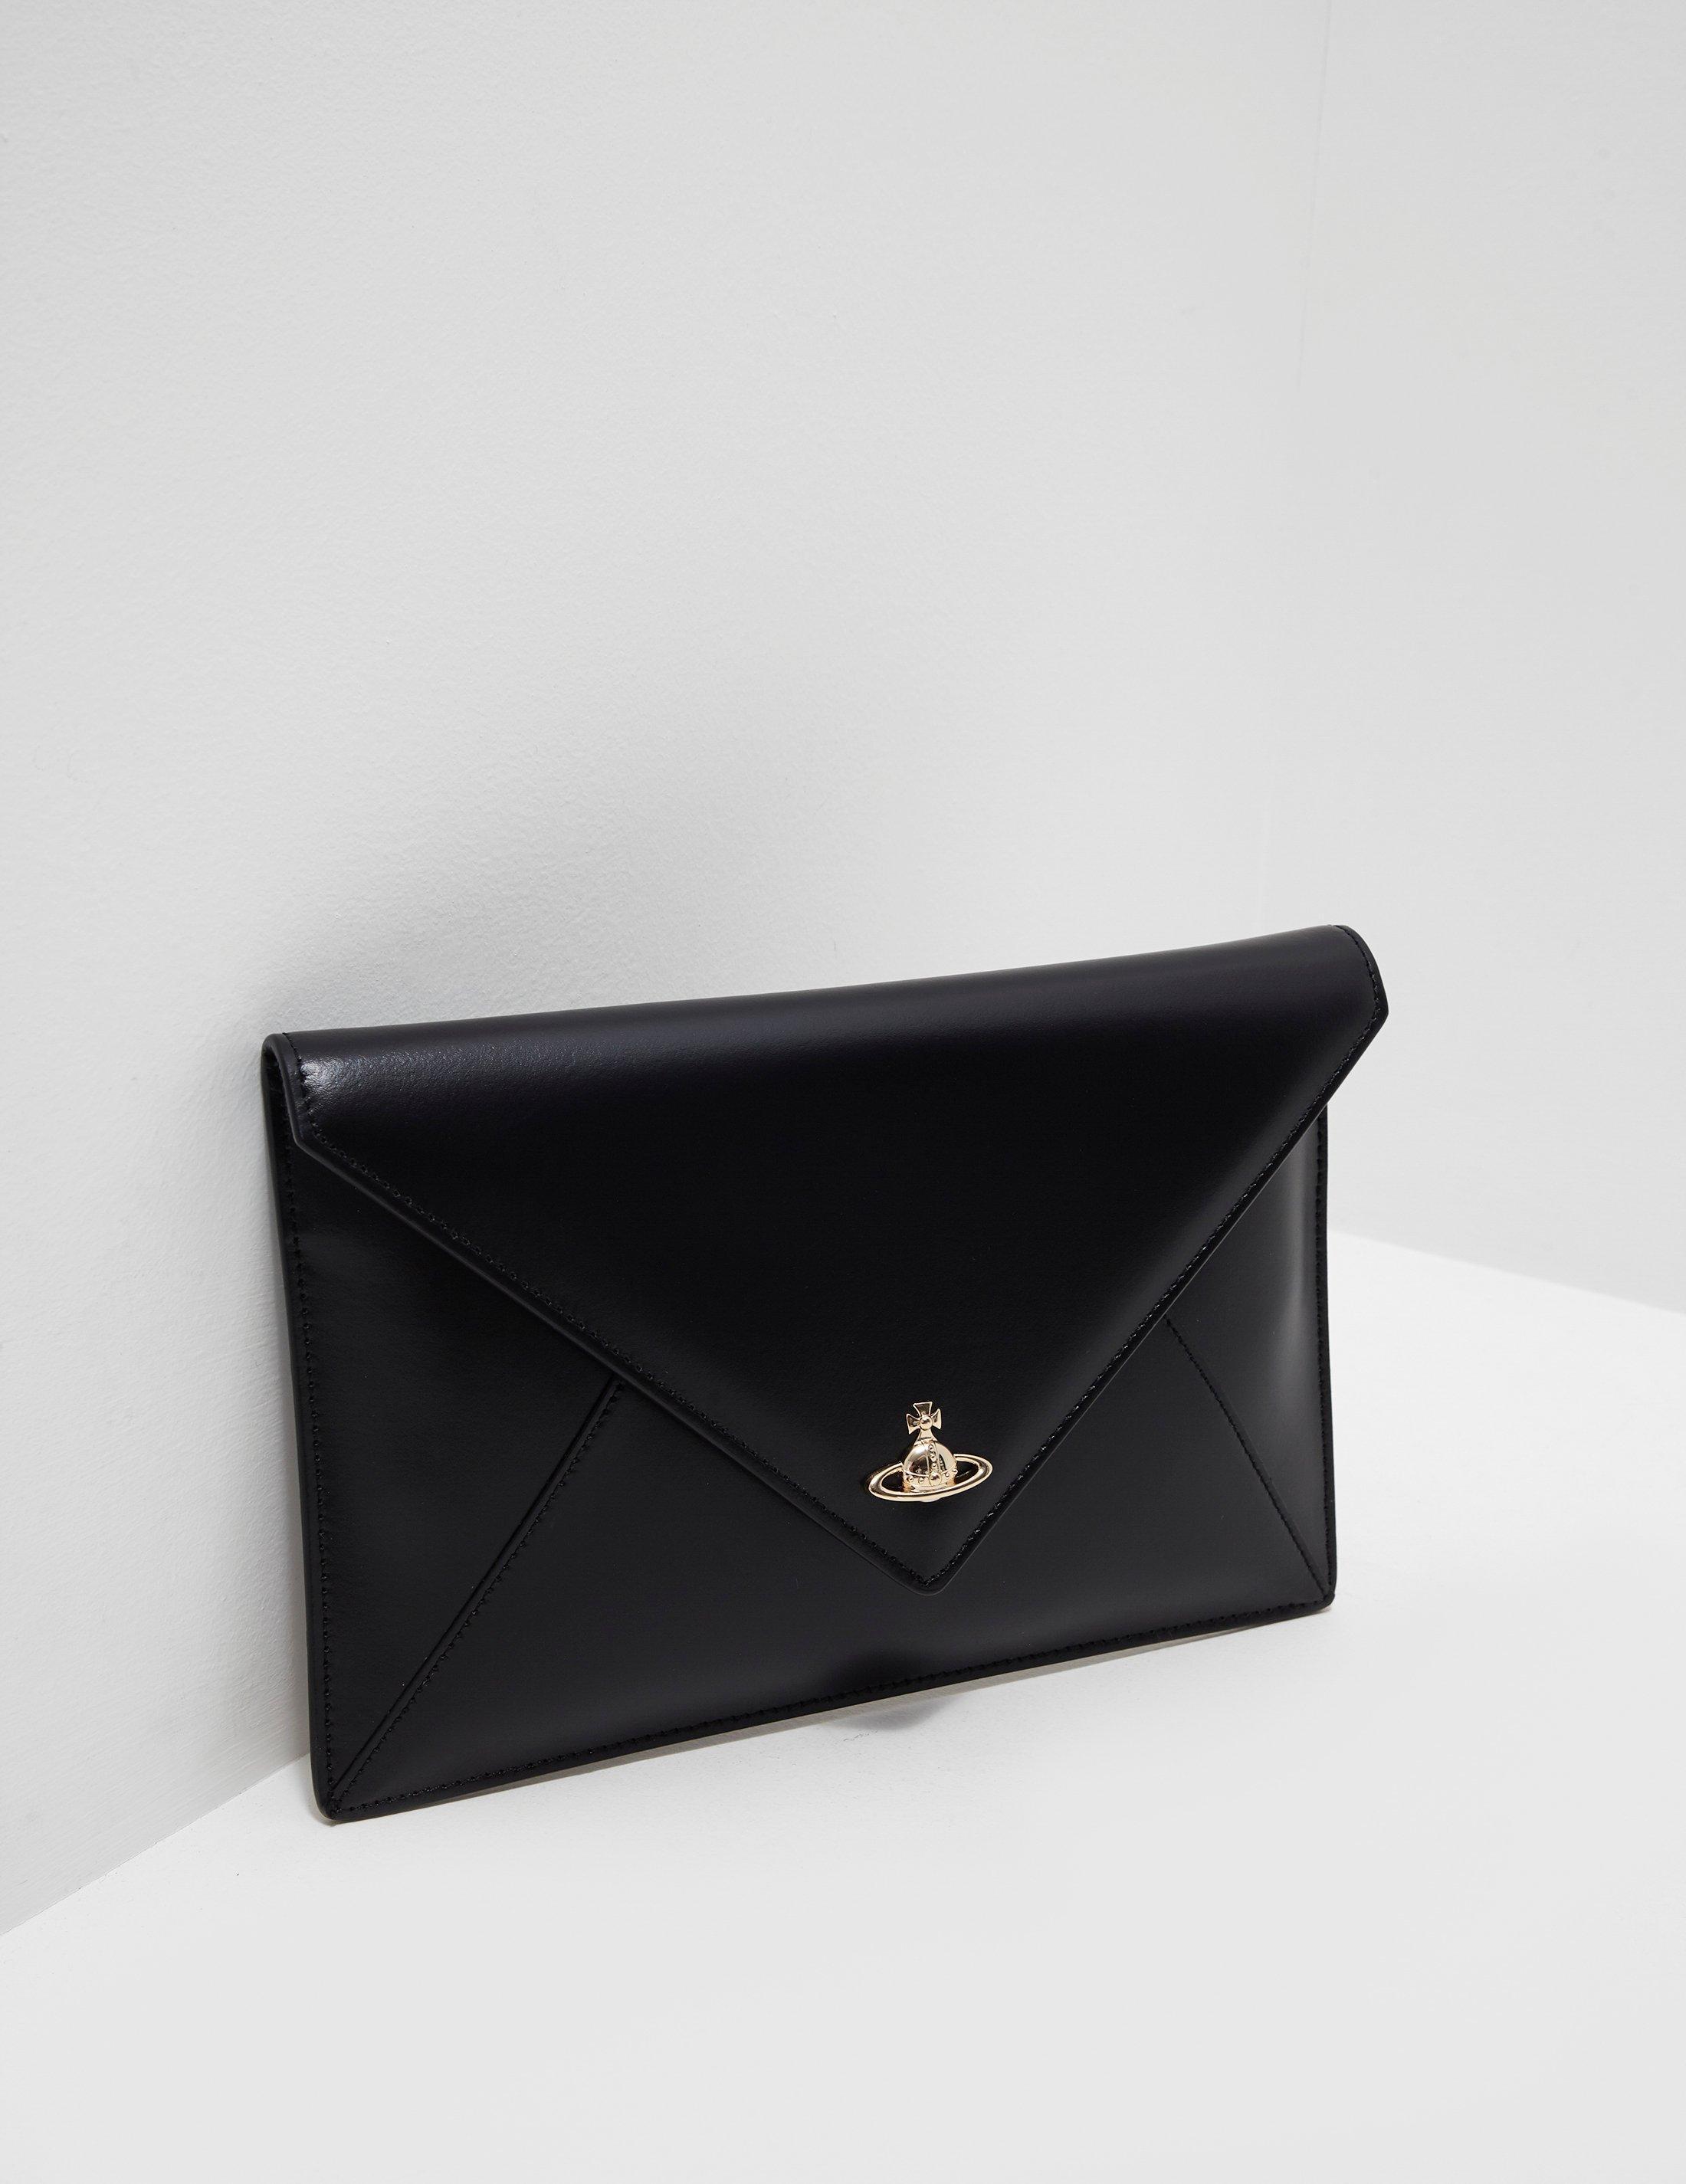 77eae0daec709 Lyst - Vivienne Westwood Private Pouch Clutch Bag Black in Black